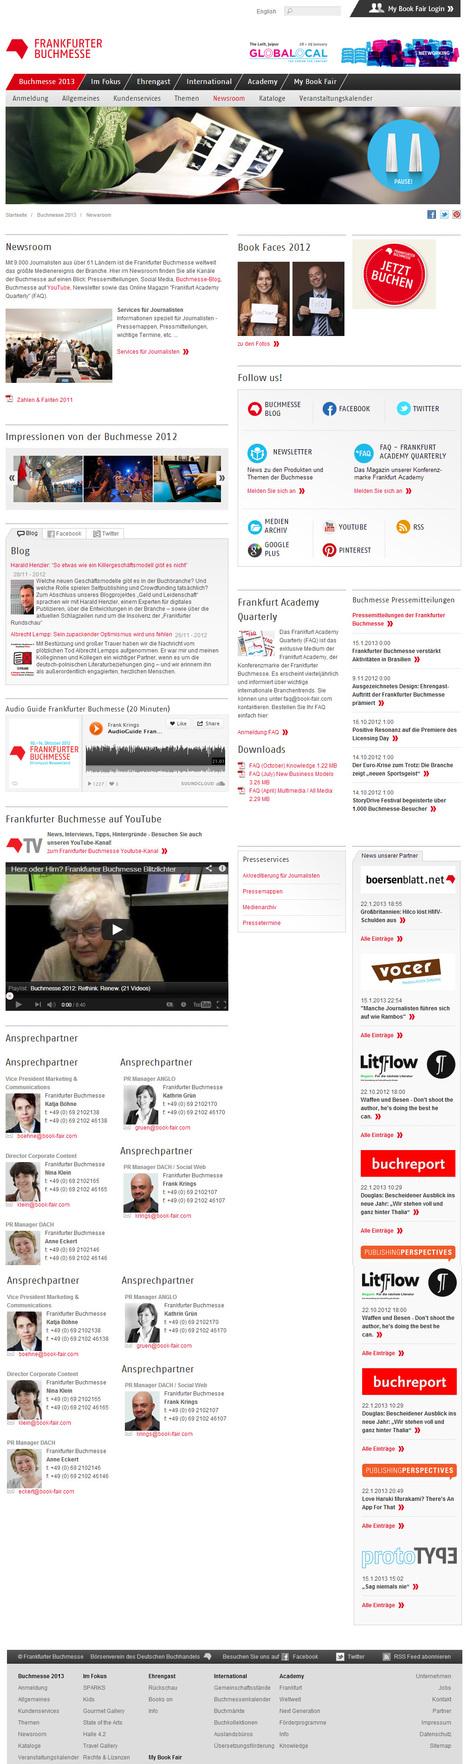 Frankfurter Buchmesse - Newsroom   Social Media Newsrooms   Scoop.it